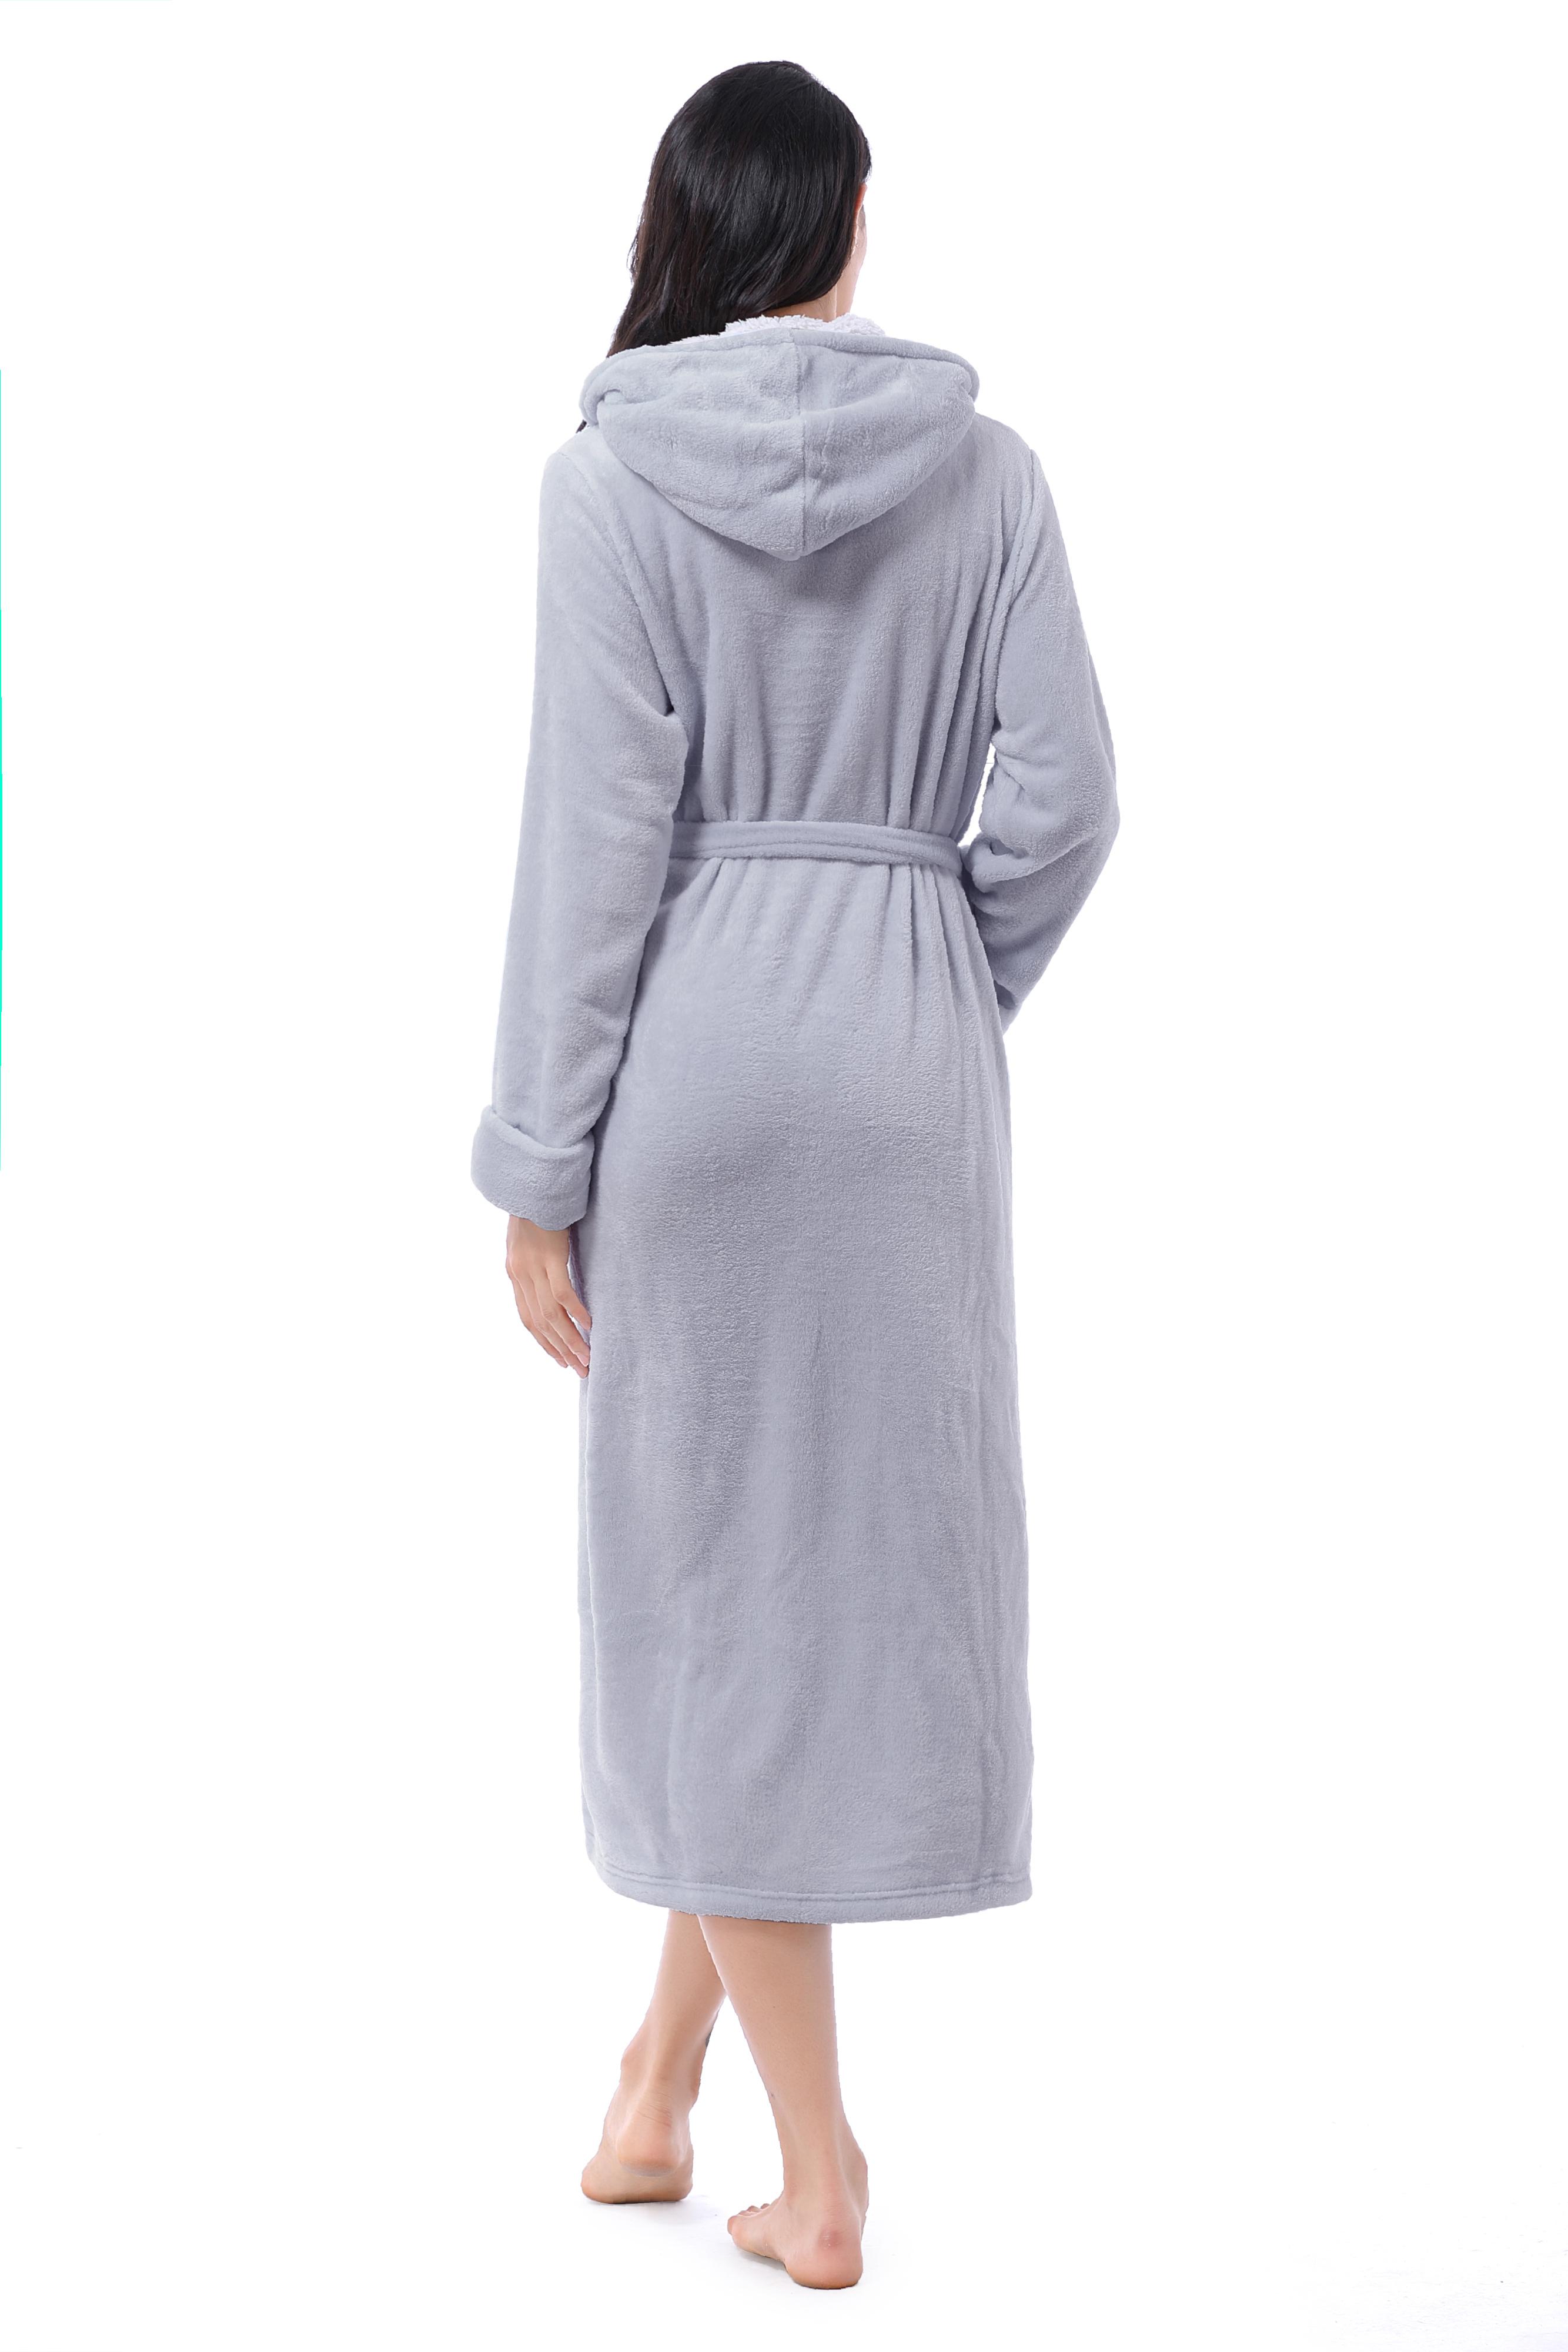 Hooded Sherpa Robe Long Plush Fuzzy Bathrobe For Women With Hood Sherpa Lined Ebay